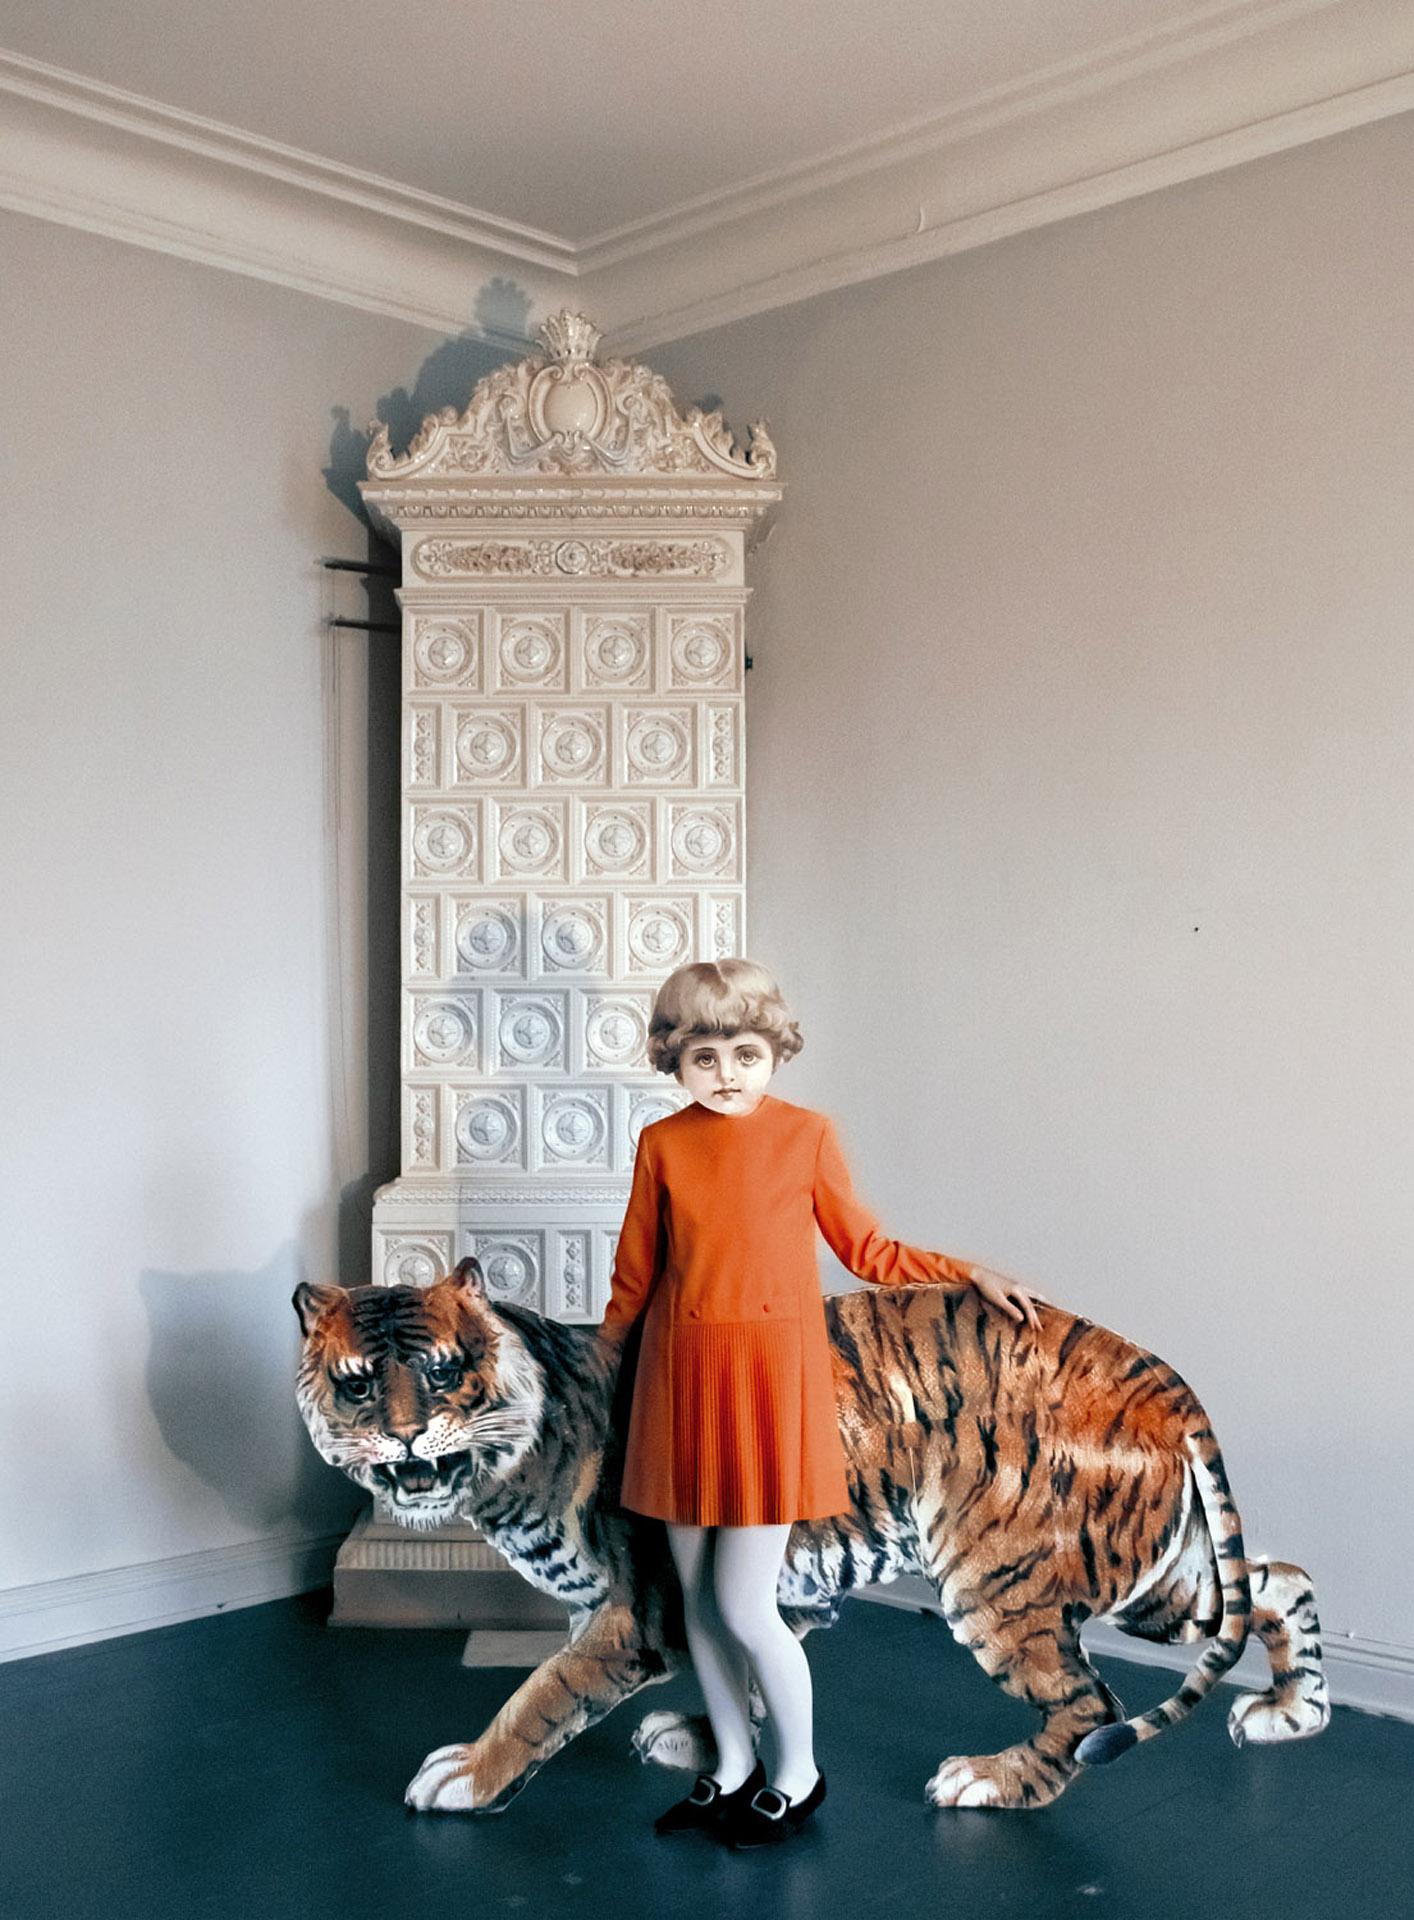 Series: Milavida, Girl and the Tiger, 2012. 75cm x 50cm E.D 5/5 + 2 AP. 39,5cm x 29cm E.D. 2/5.